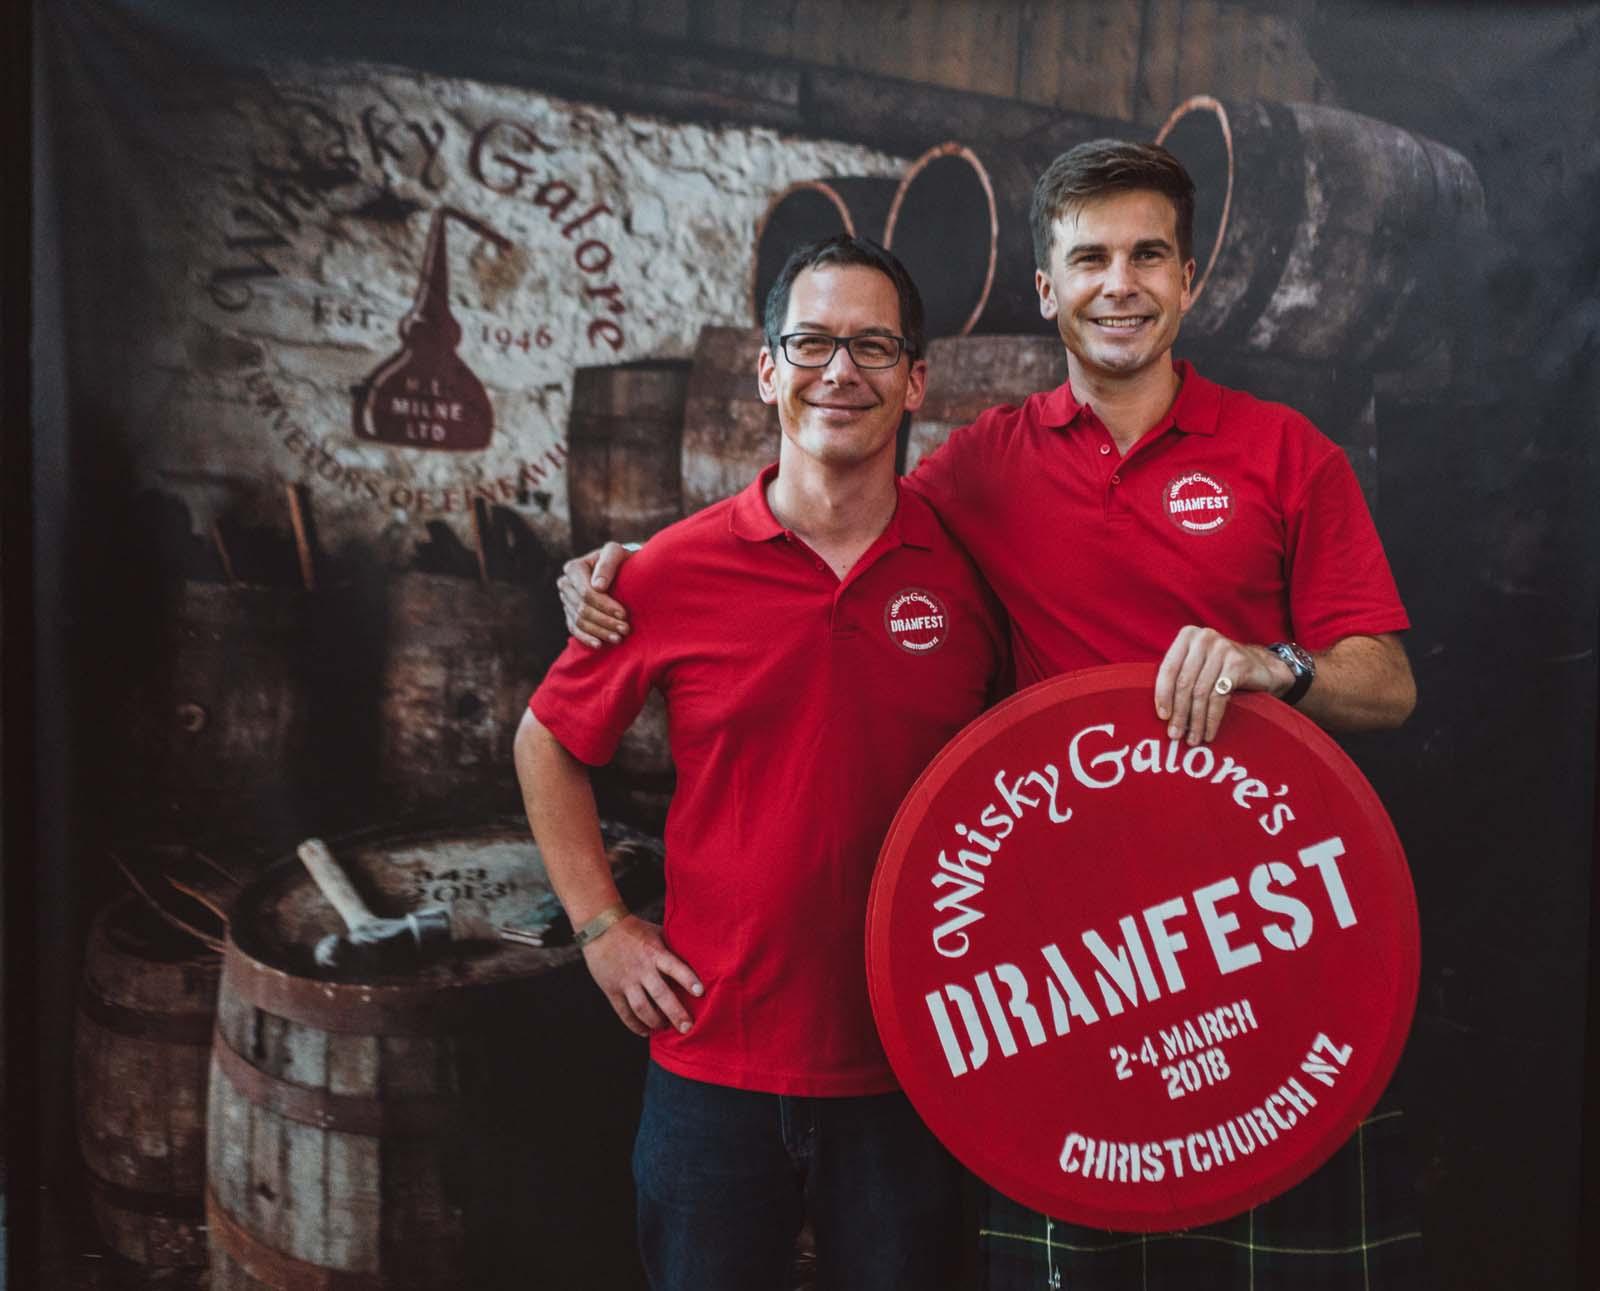 Dramfest 2018 for Whisky Galore-153.jpg